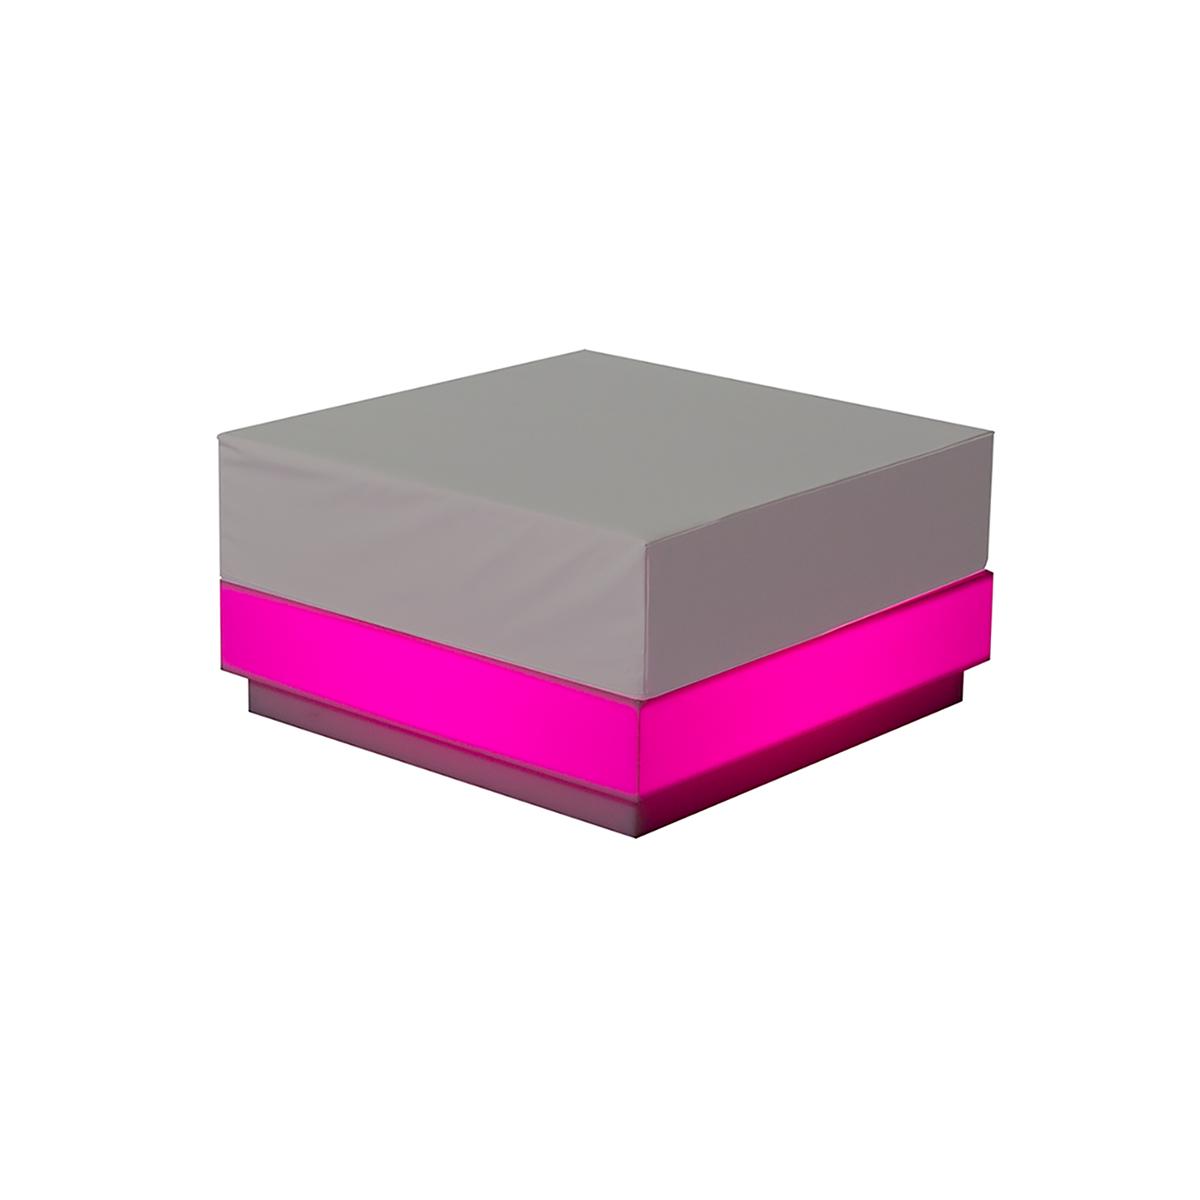 dieeventausstatter LED-Lounge RGB Quadrat pink